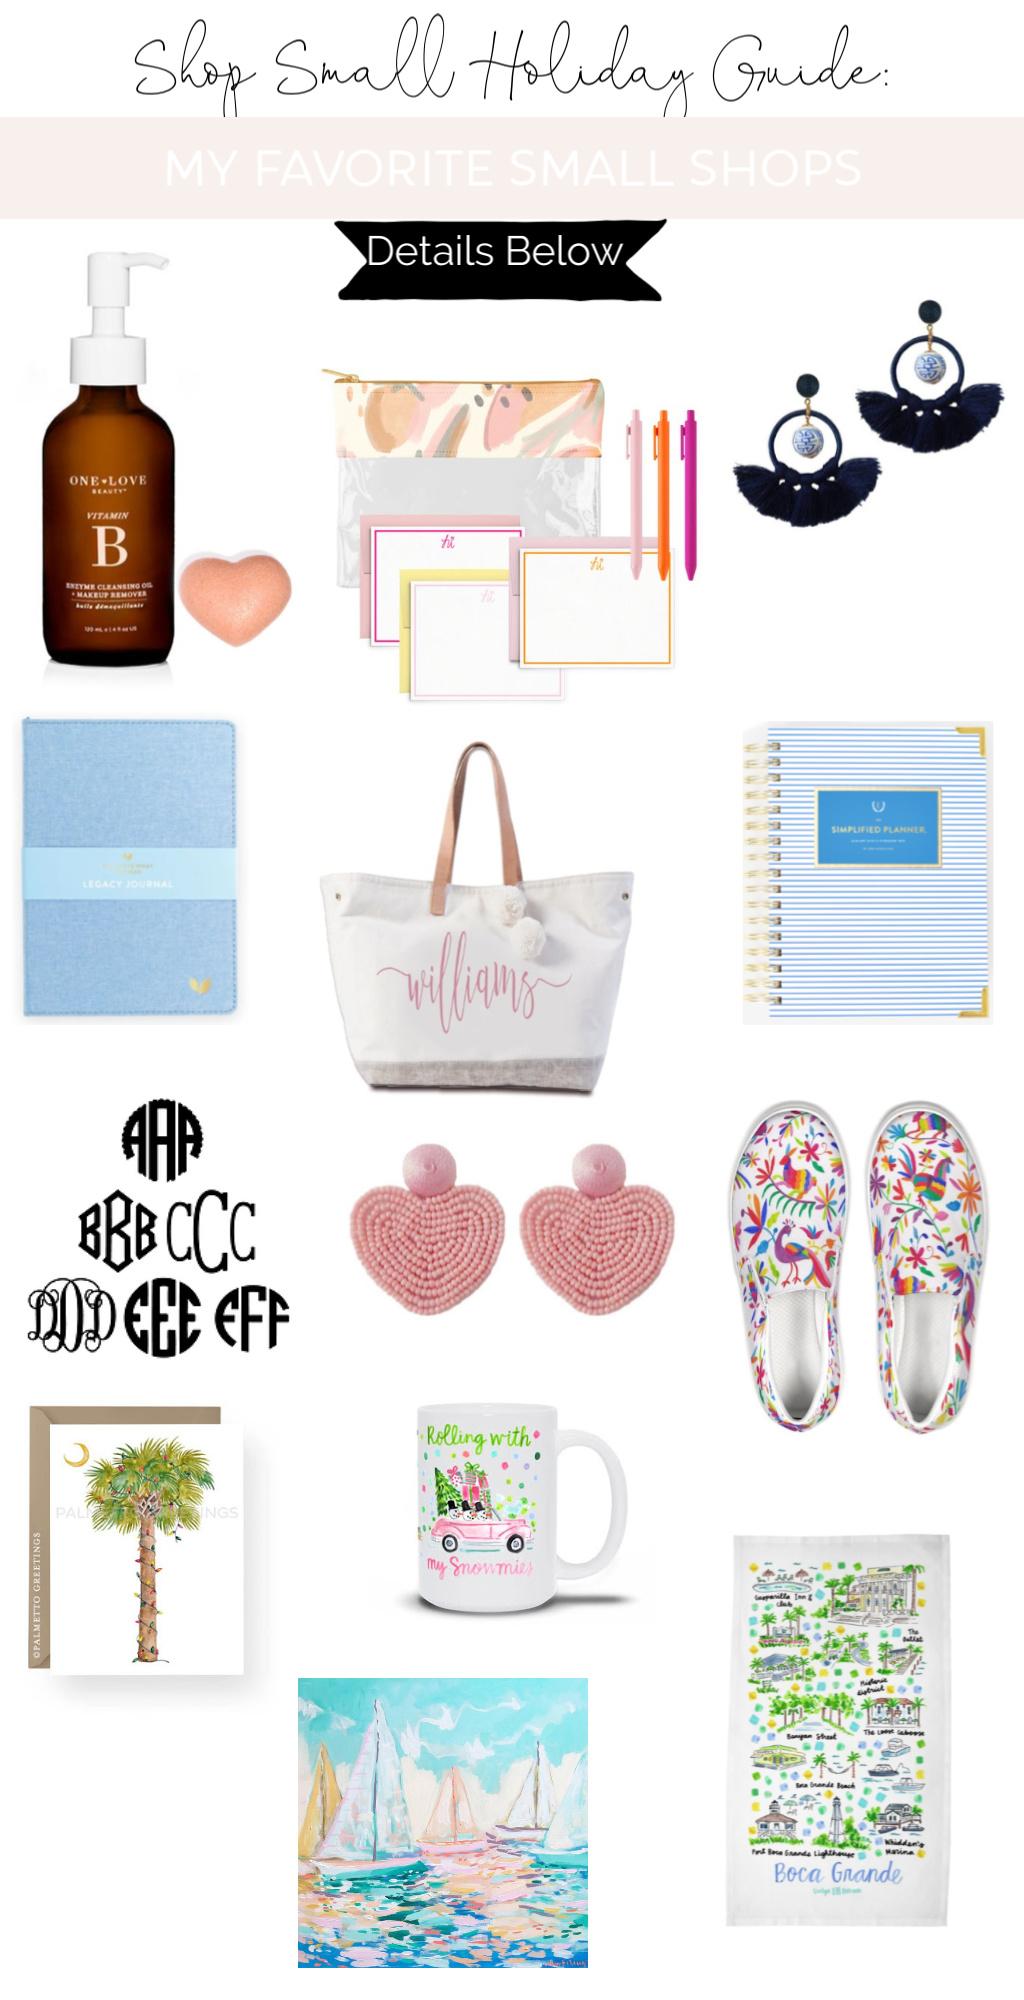 Shop Small Saturday Holiday Guide